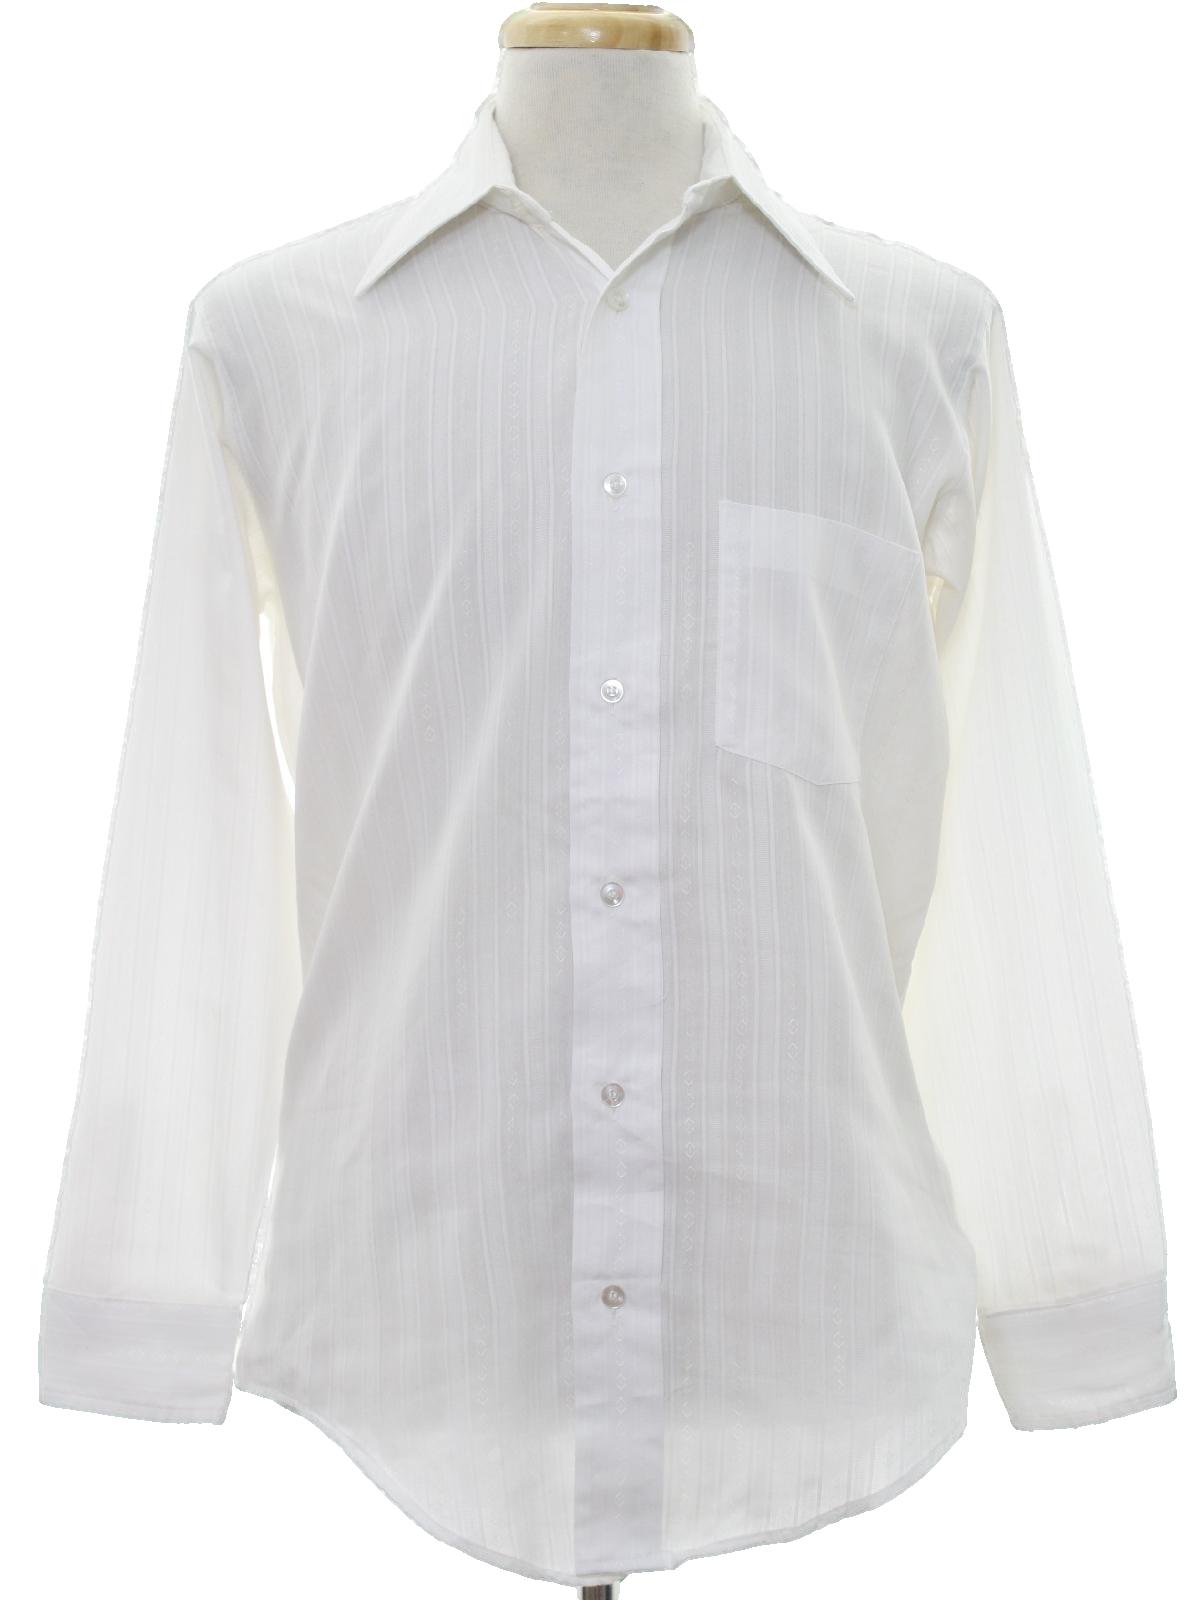 Retro 1970s disco shirt 70s kmart mens white background for Kmart button up shirts